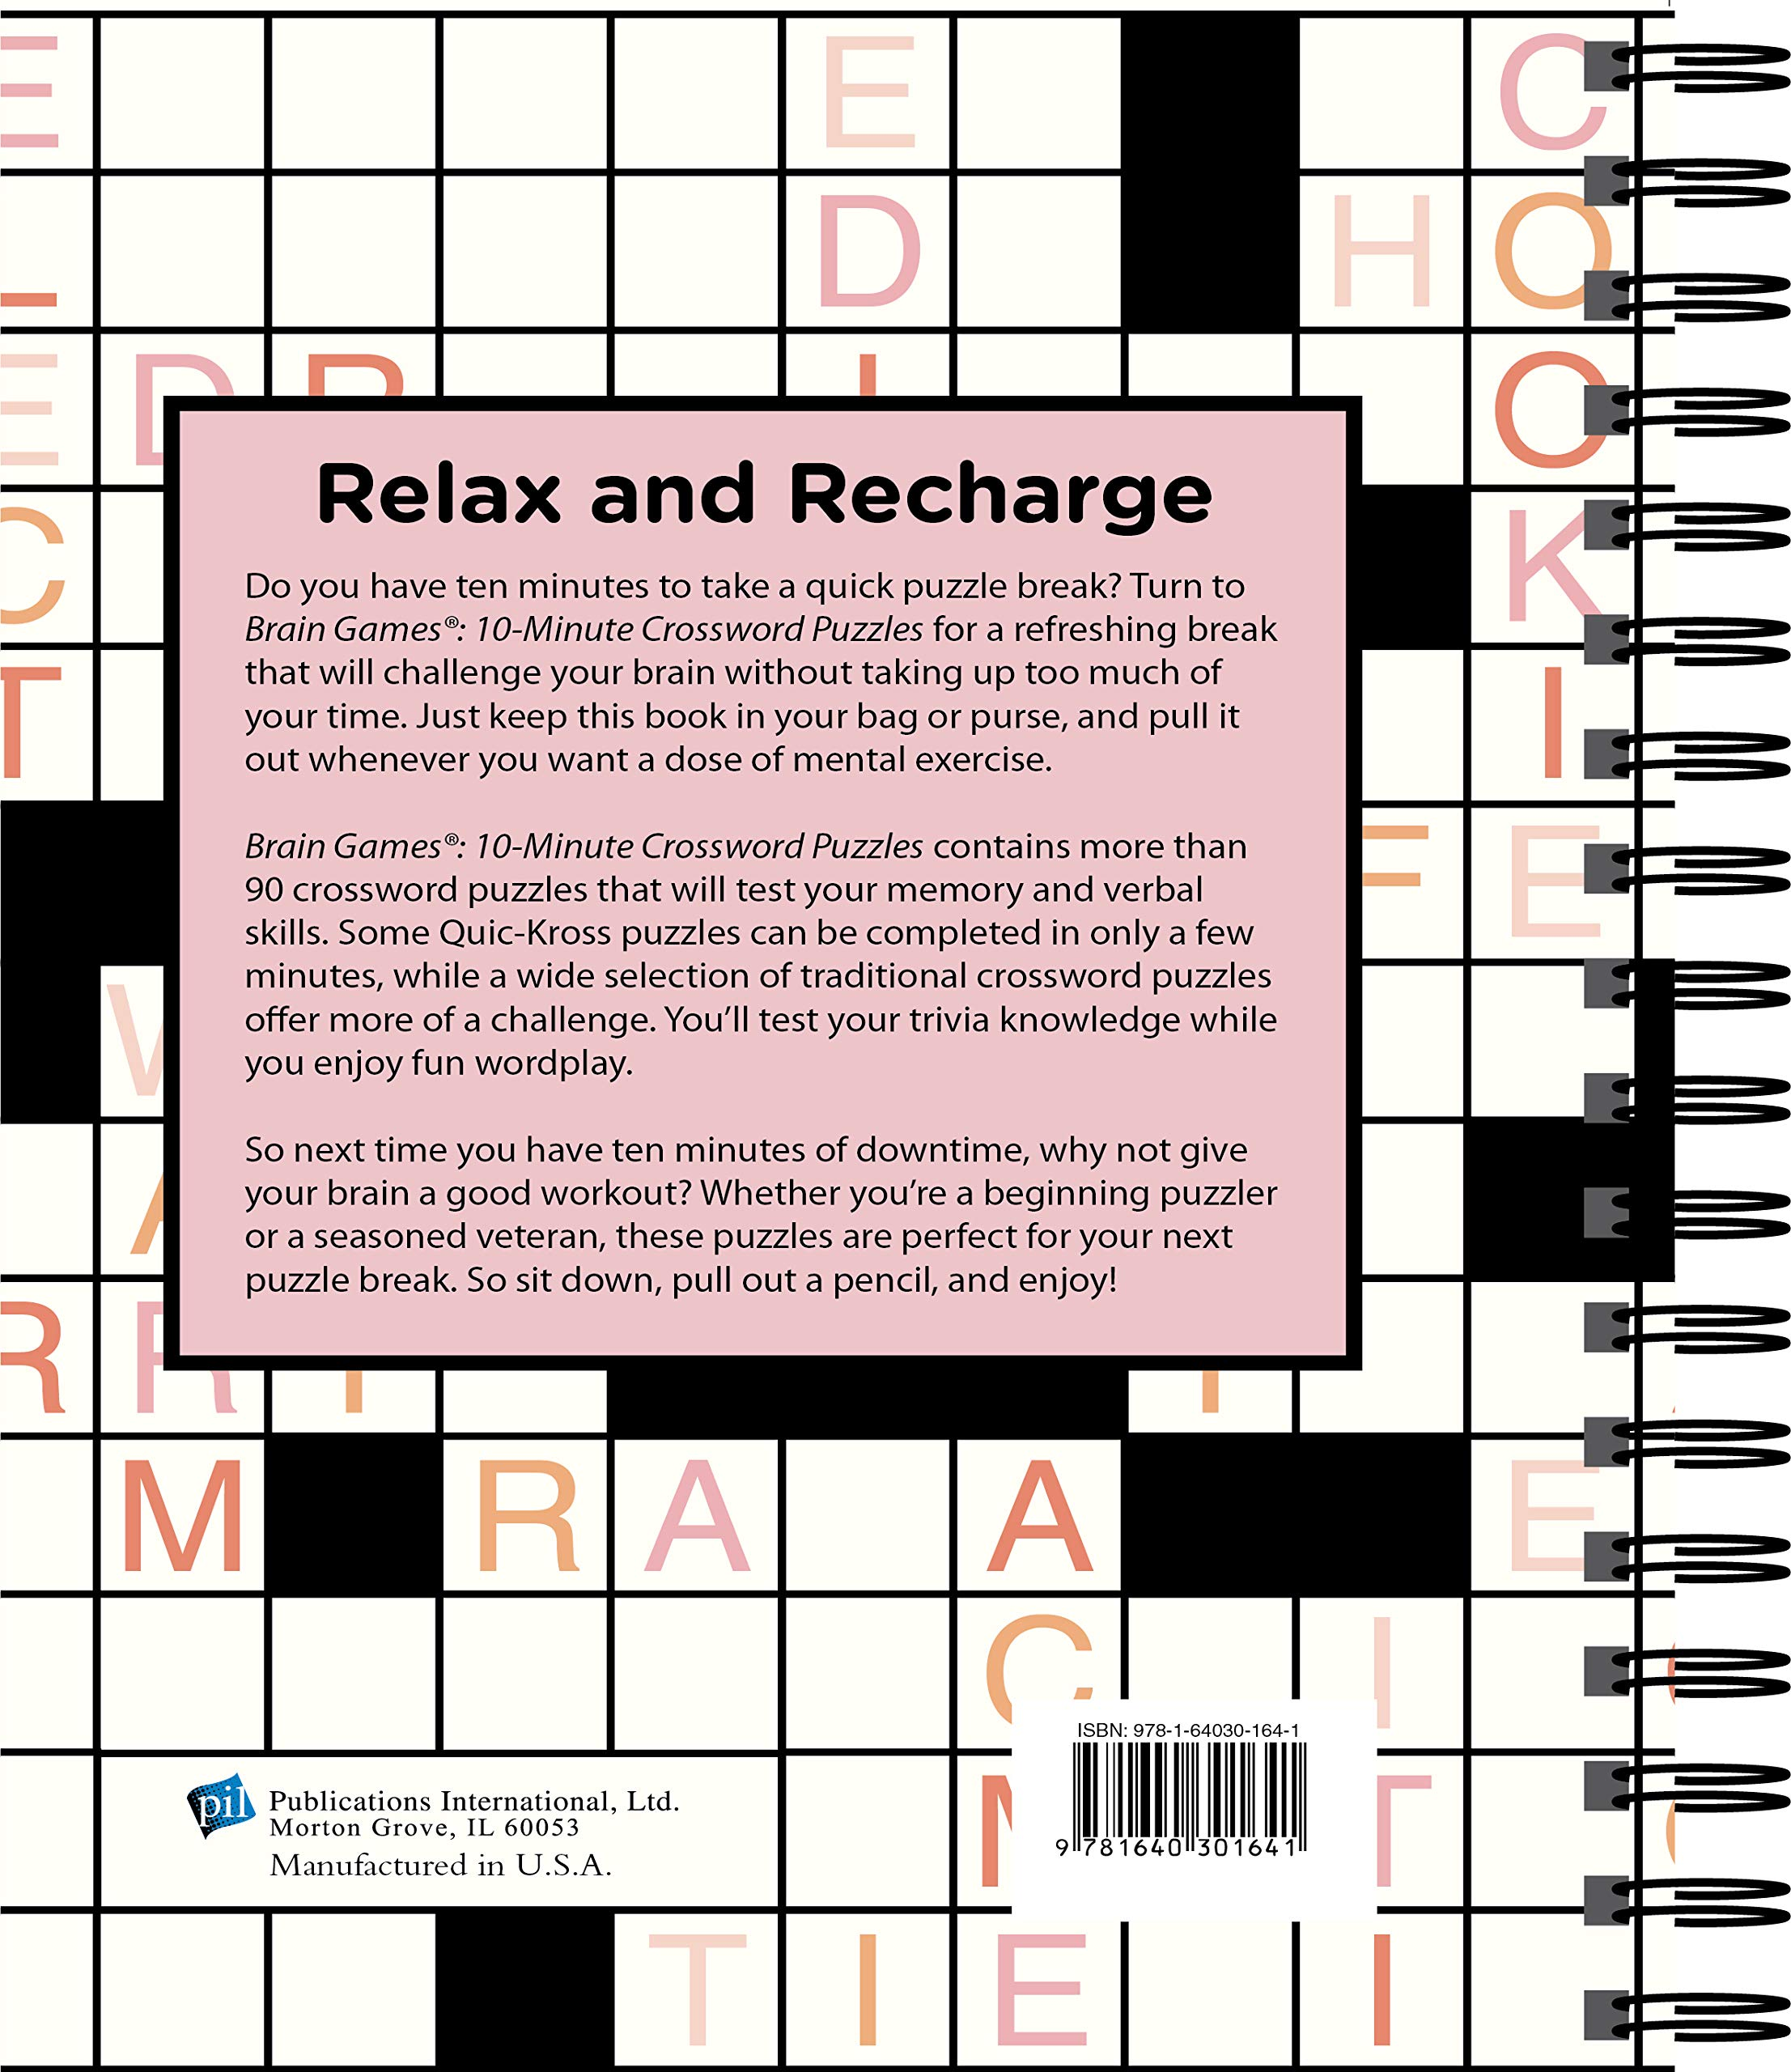 Amazon Com Brain Games 10 Minute Crossword Puzzles Pink 9781640301641 Publications International Ltd Brain Games Books